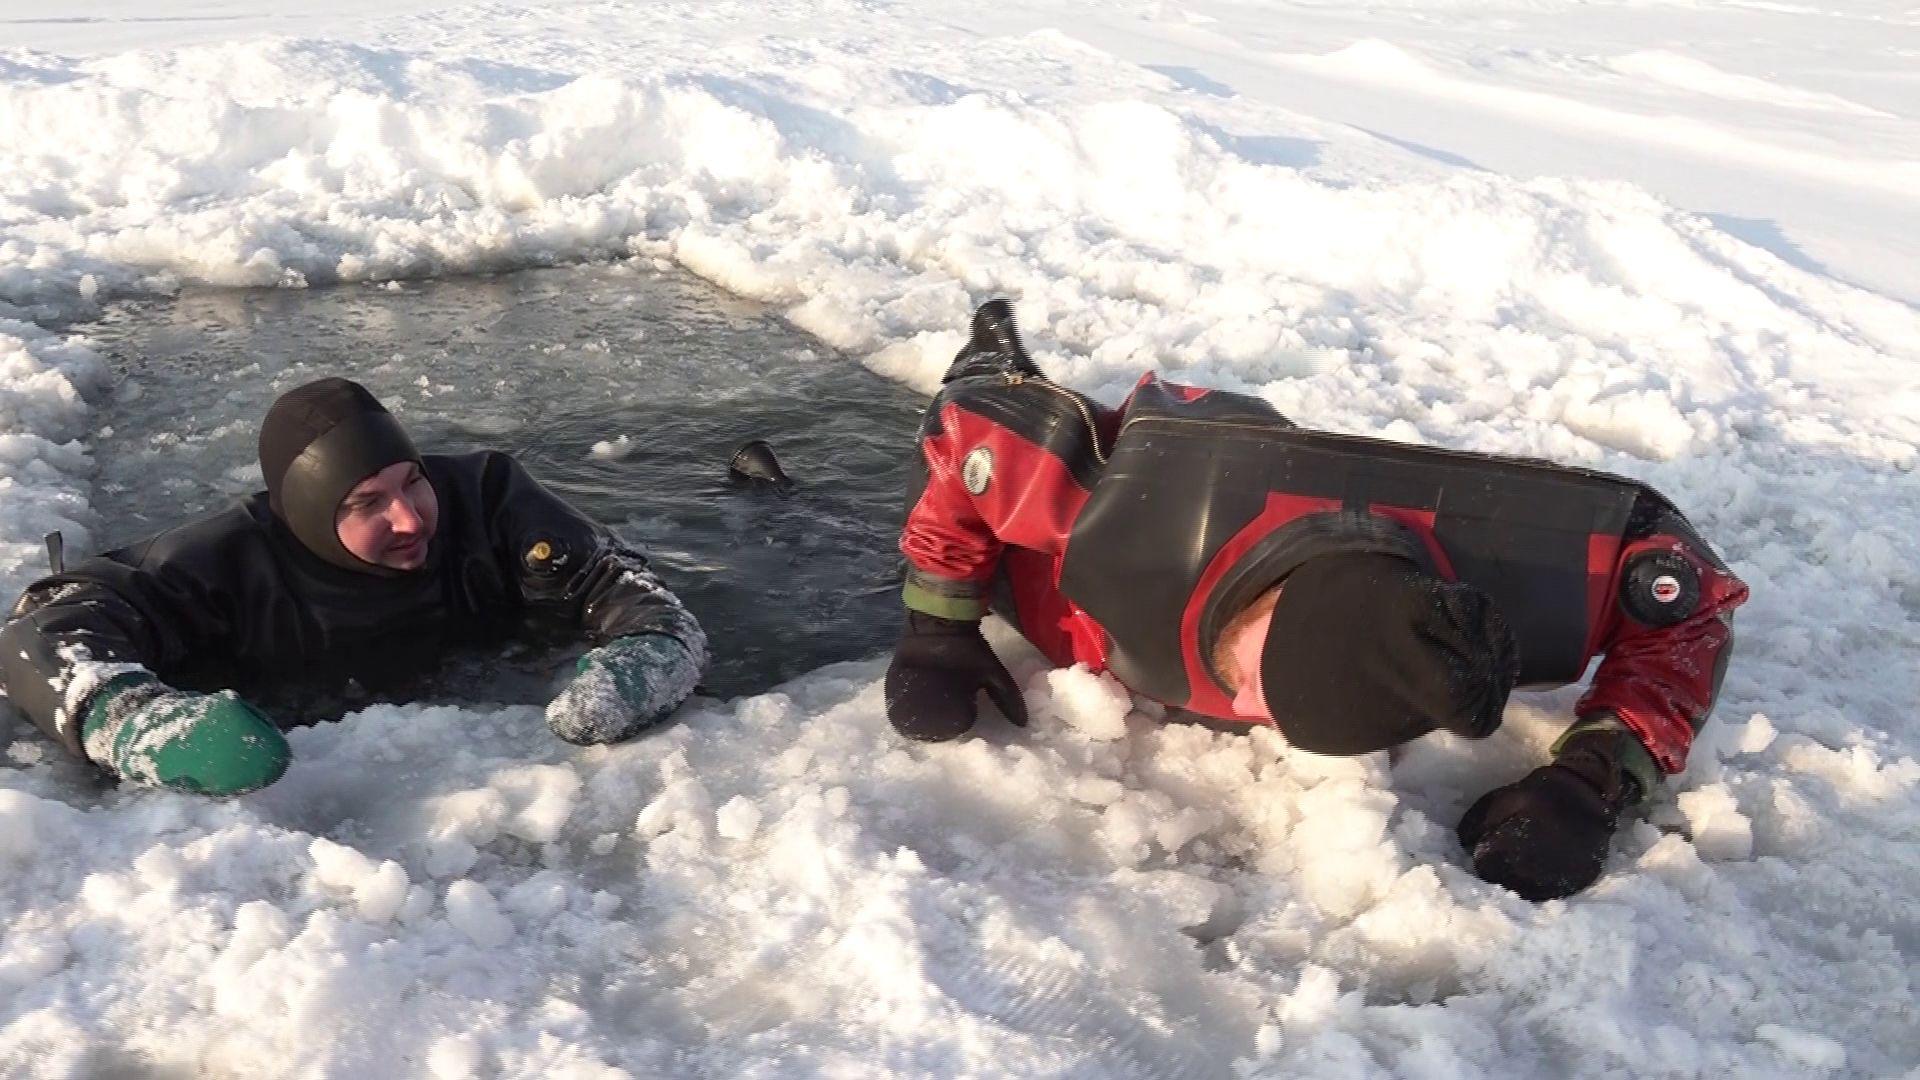 В Ярославле накануне Крещения спасатели провели учения